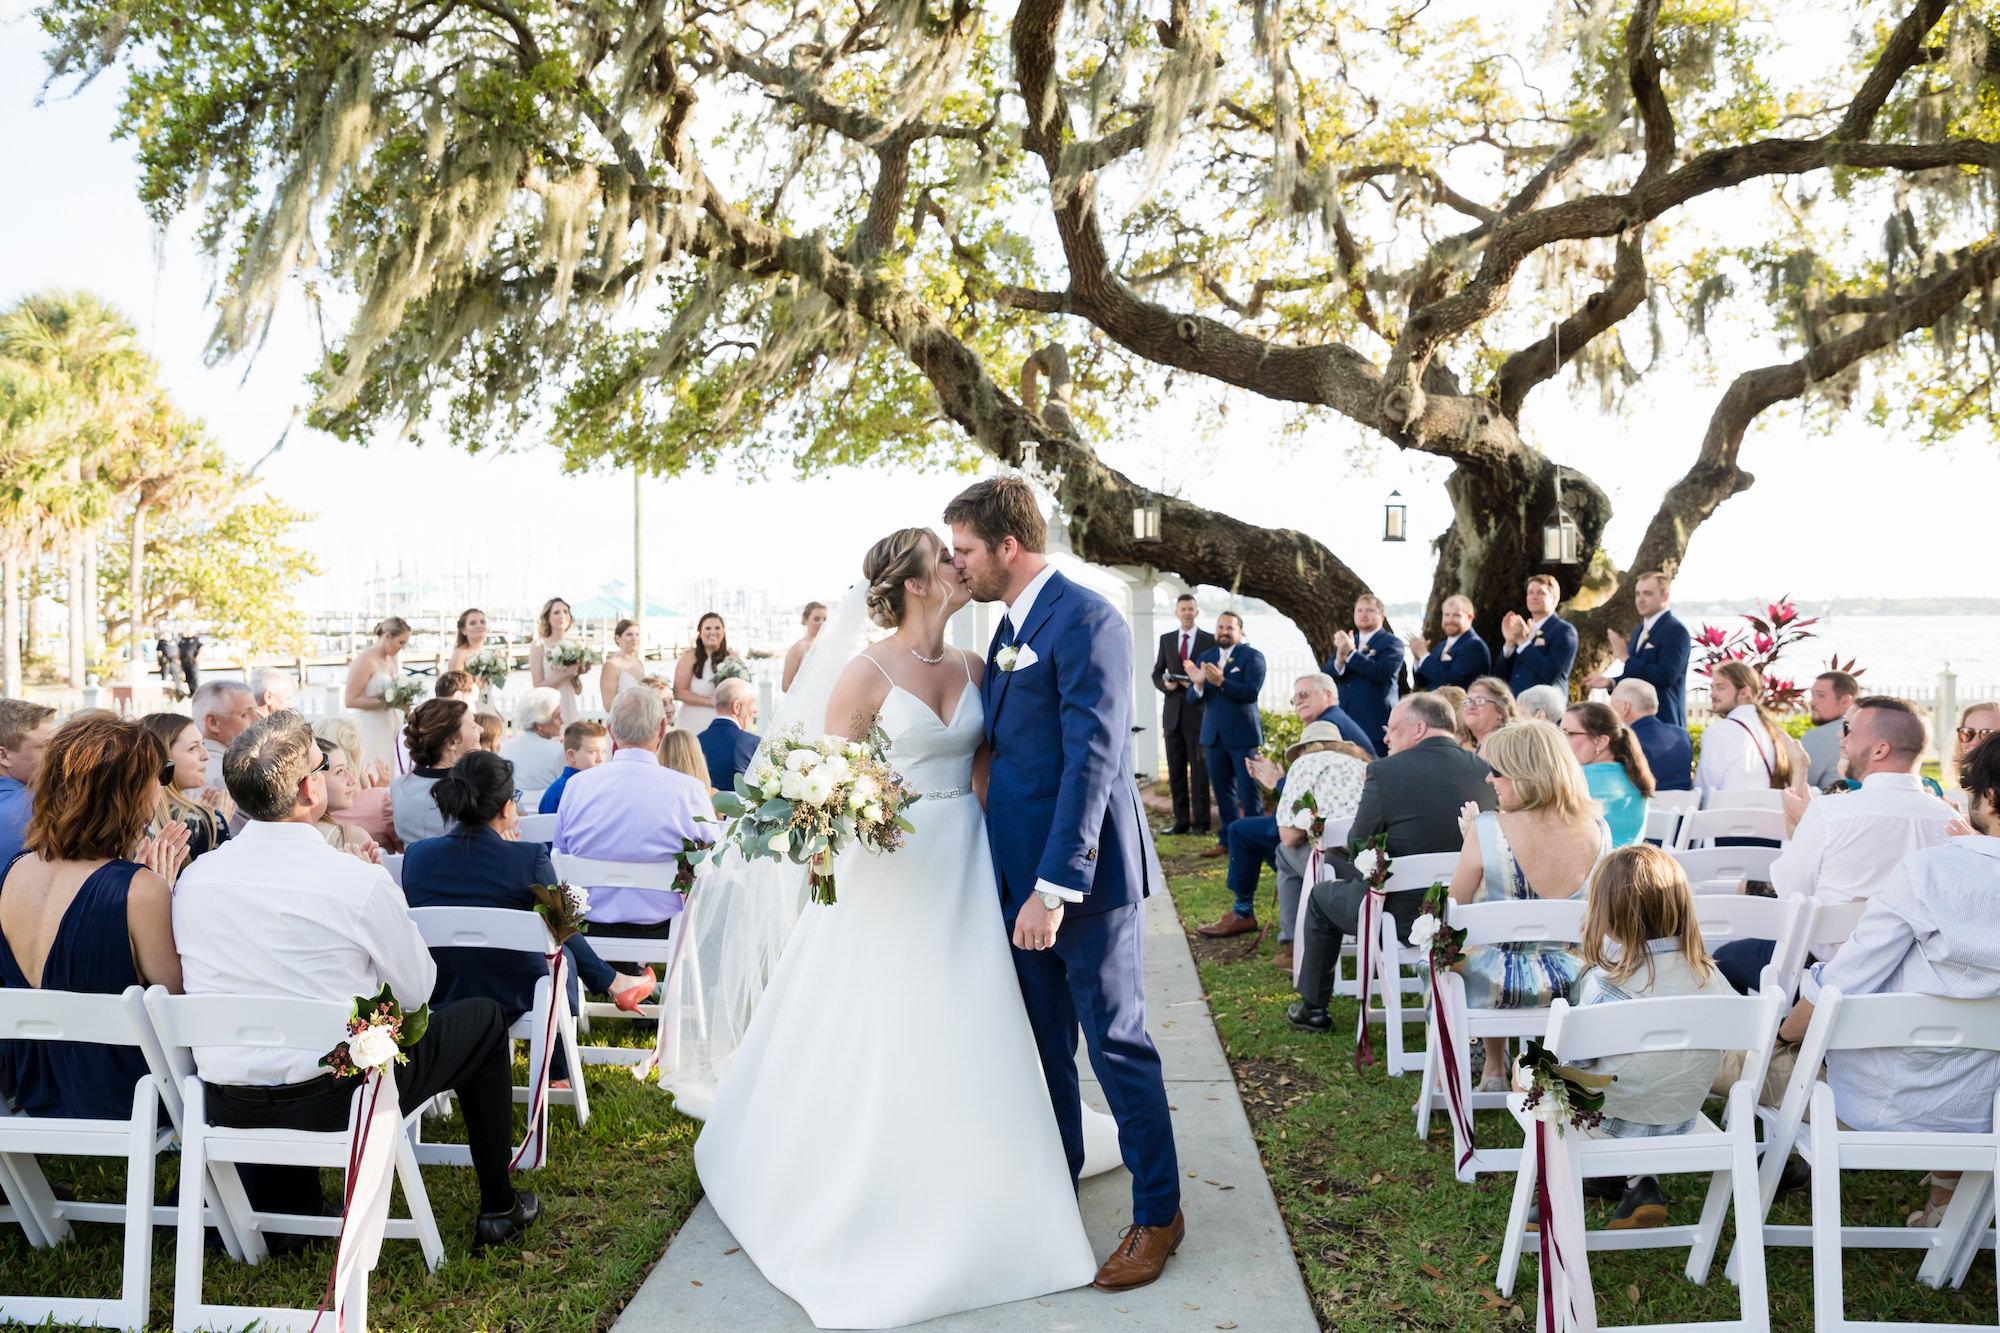 Tampa Bay Classic Bride and Groom Kiss Recessional Wedding Portrait   Waterfront Outdoor Wedding Venue Palmetto Riverside Bed and Breakfast   Wedding Planner Coastal Coordinator